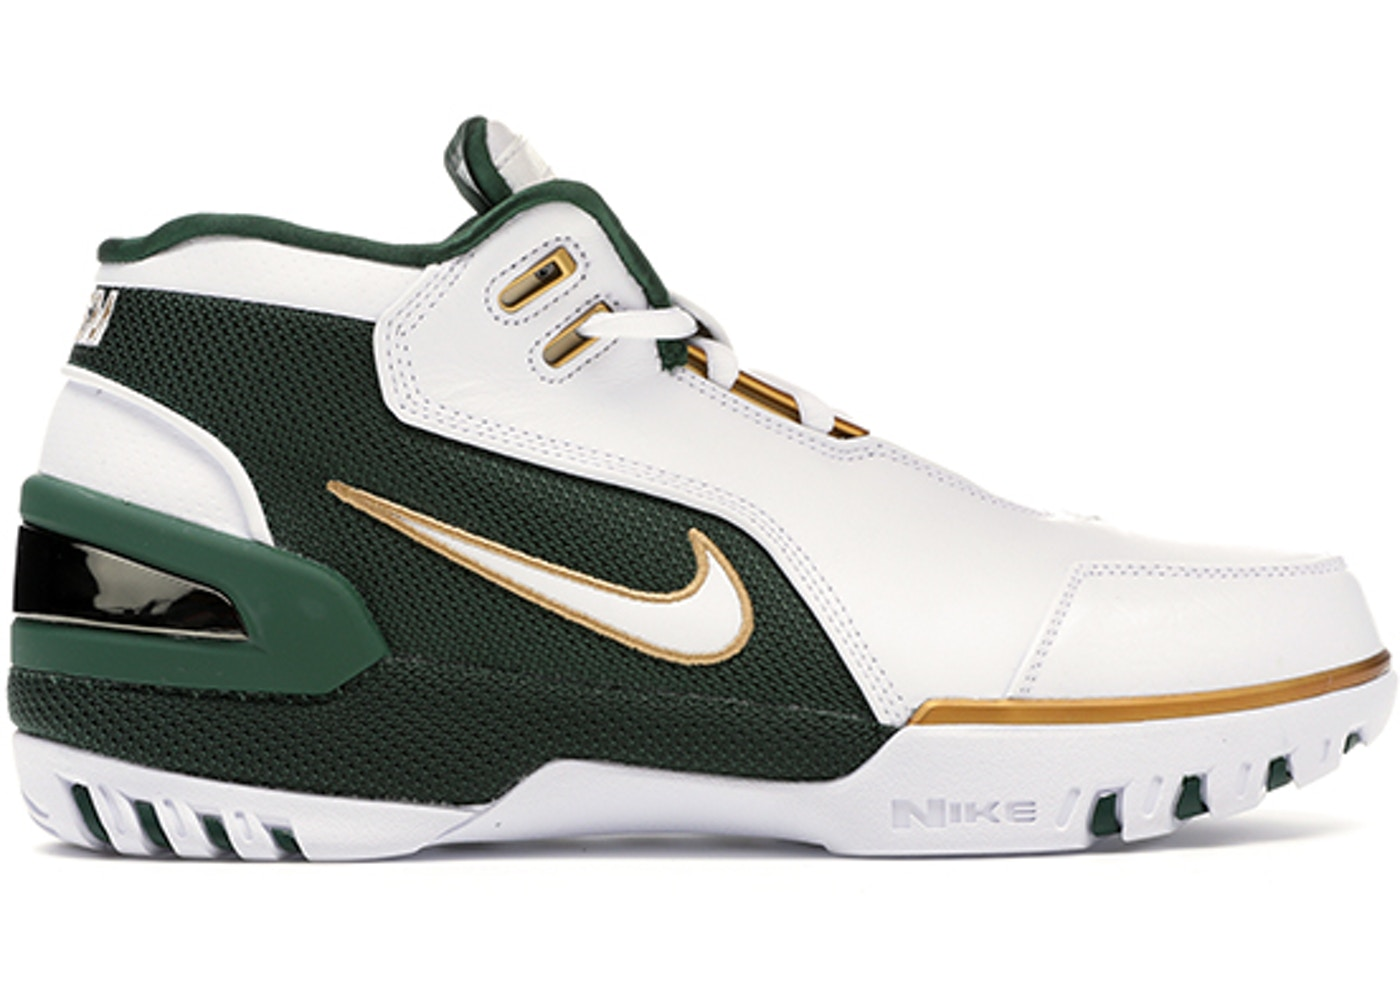 32faae77a Buy Nike LeBron Shoes   Deadstock Sneakers